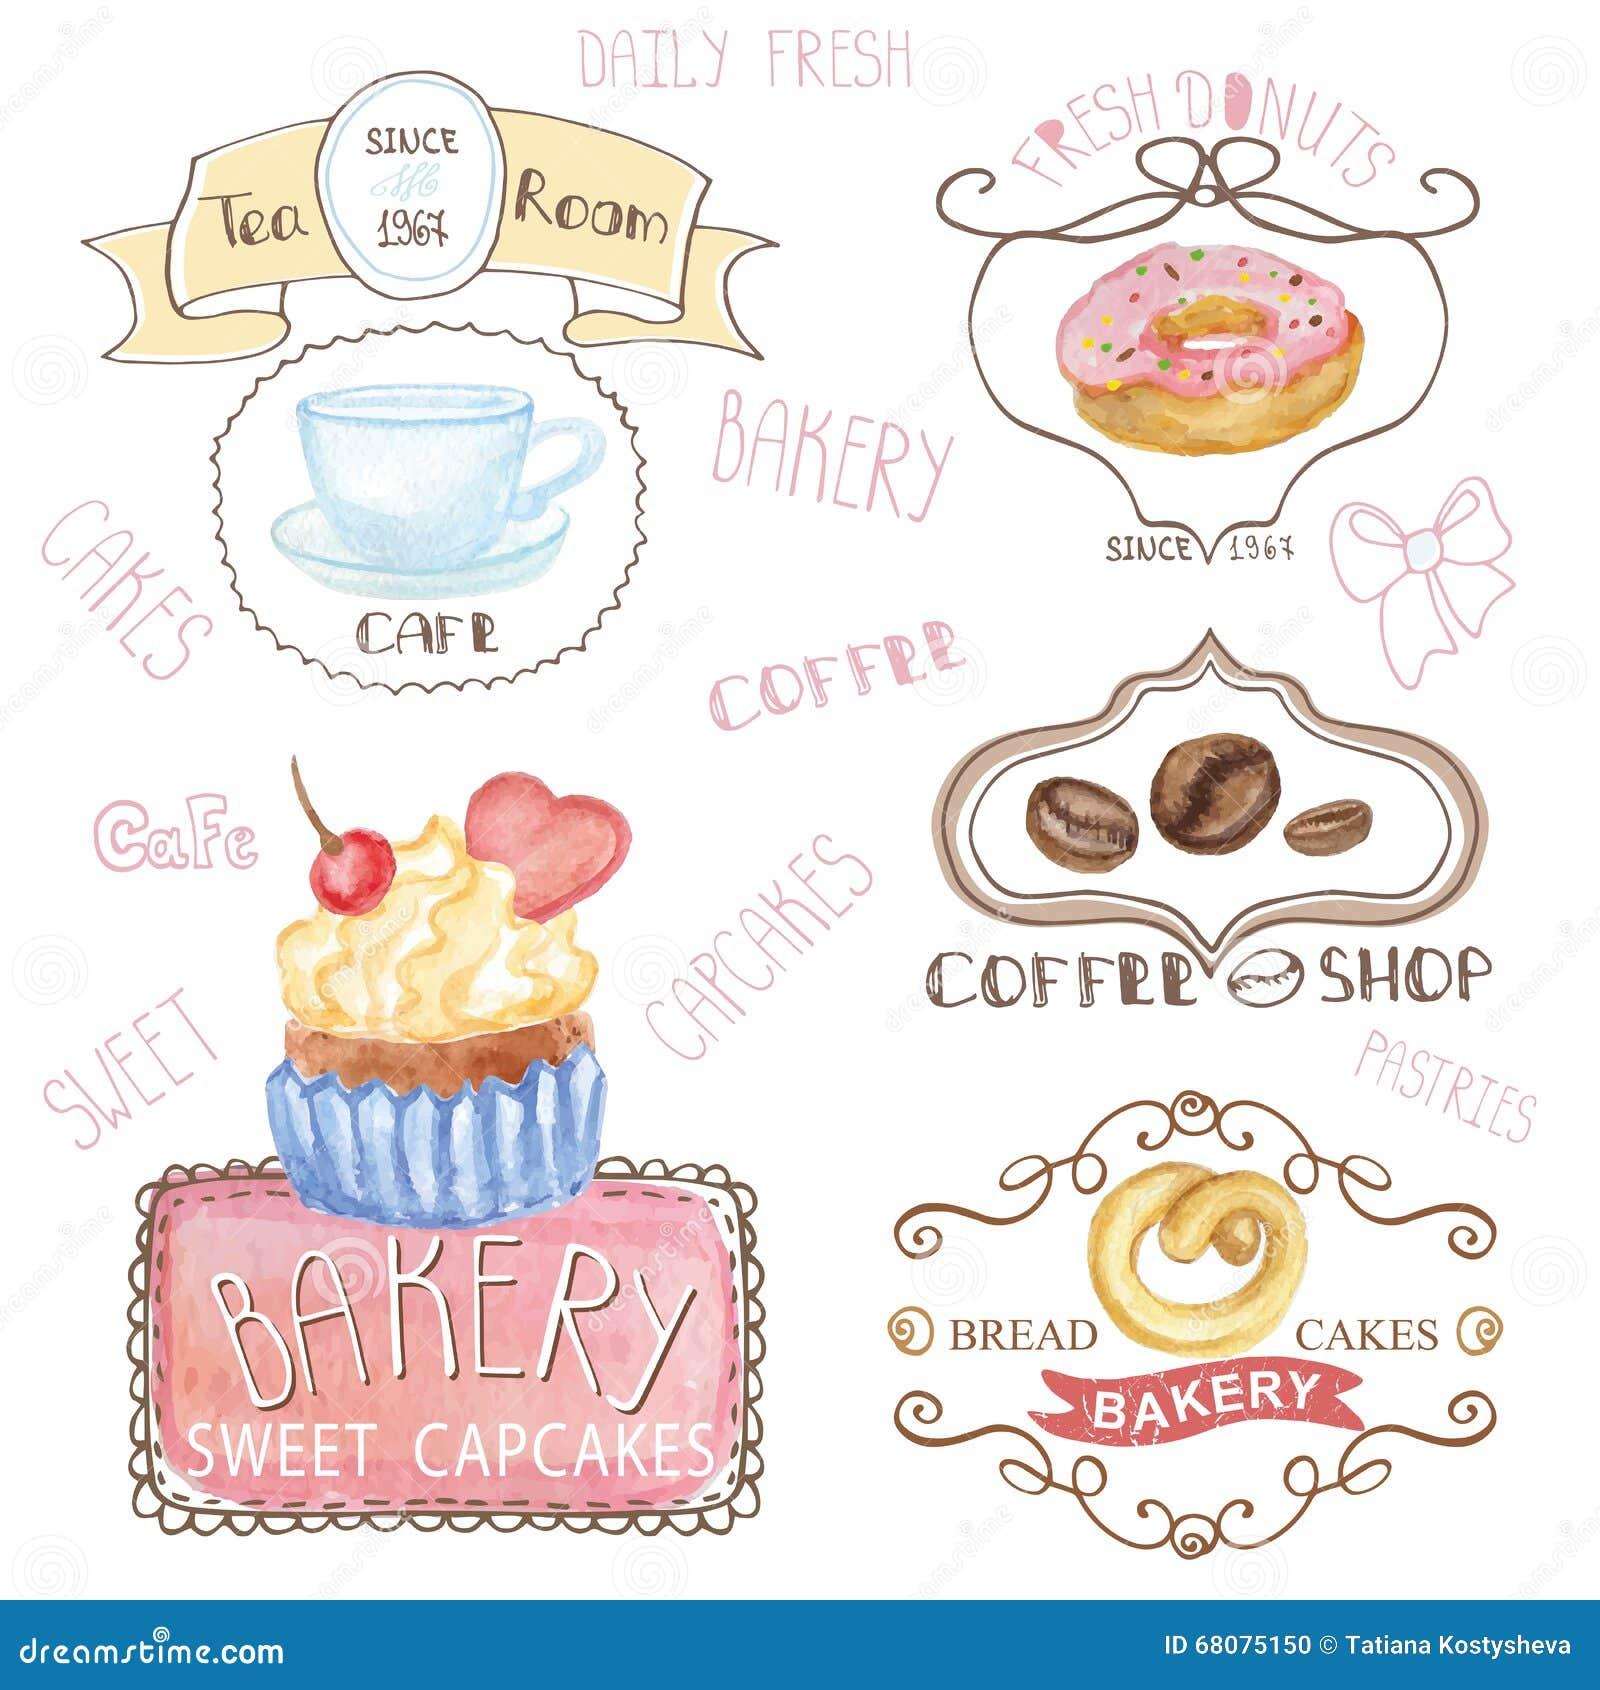 Watercolour Bakery Cafe